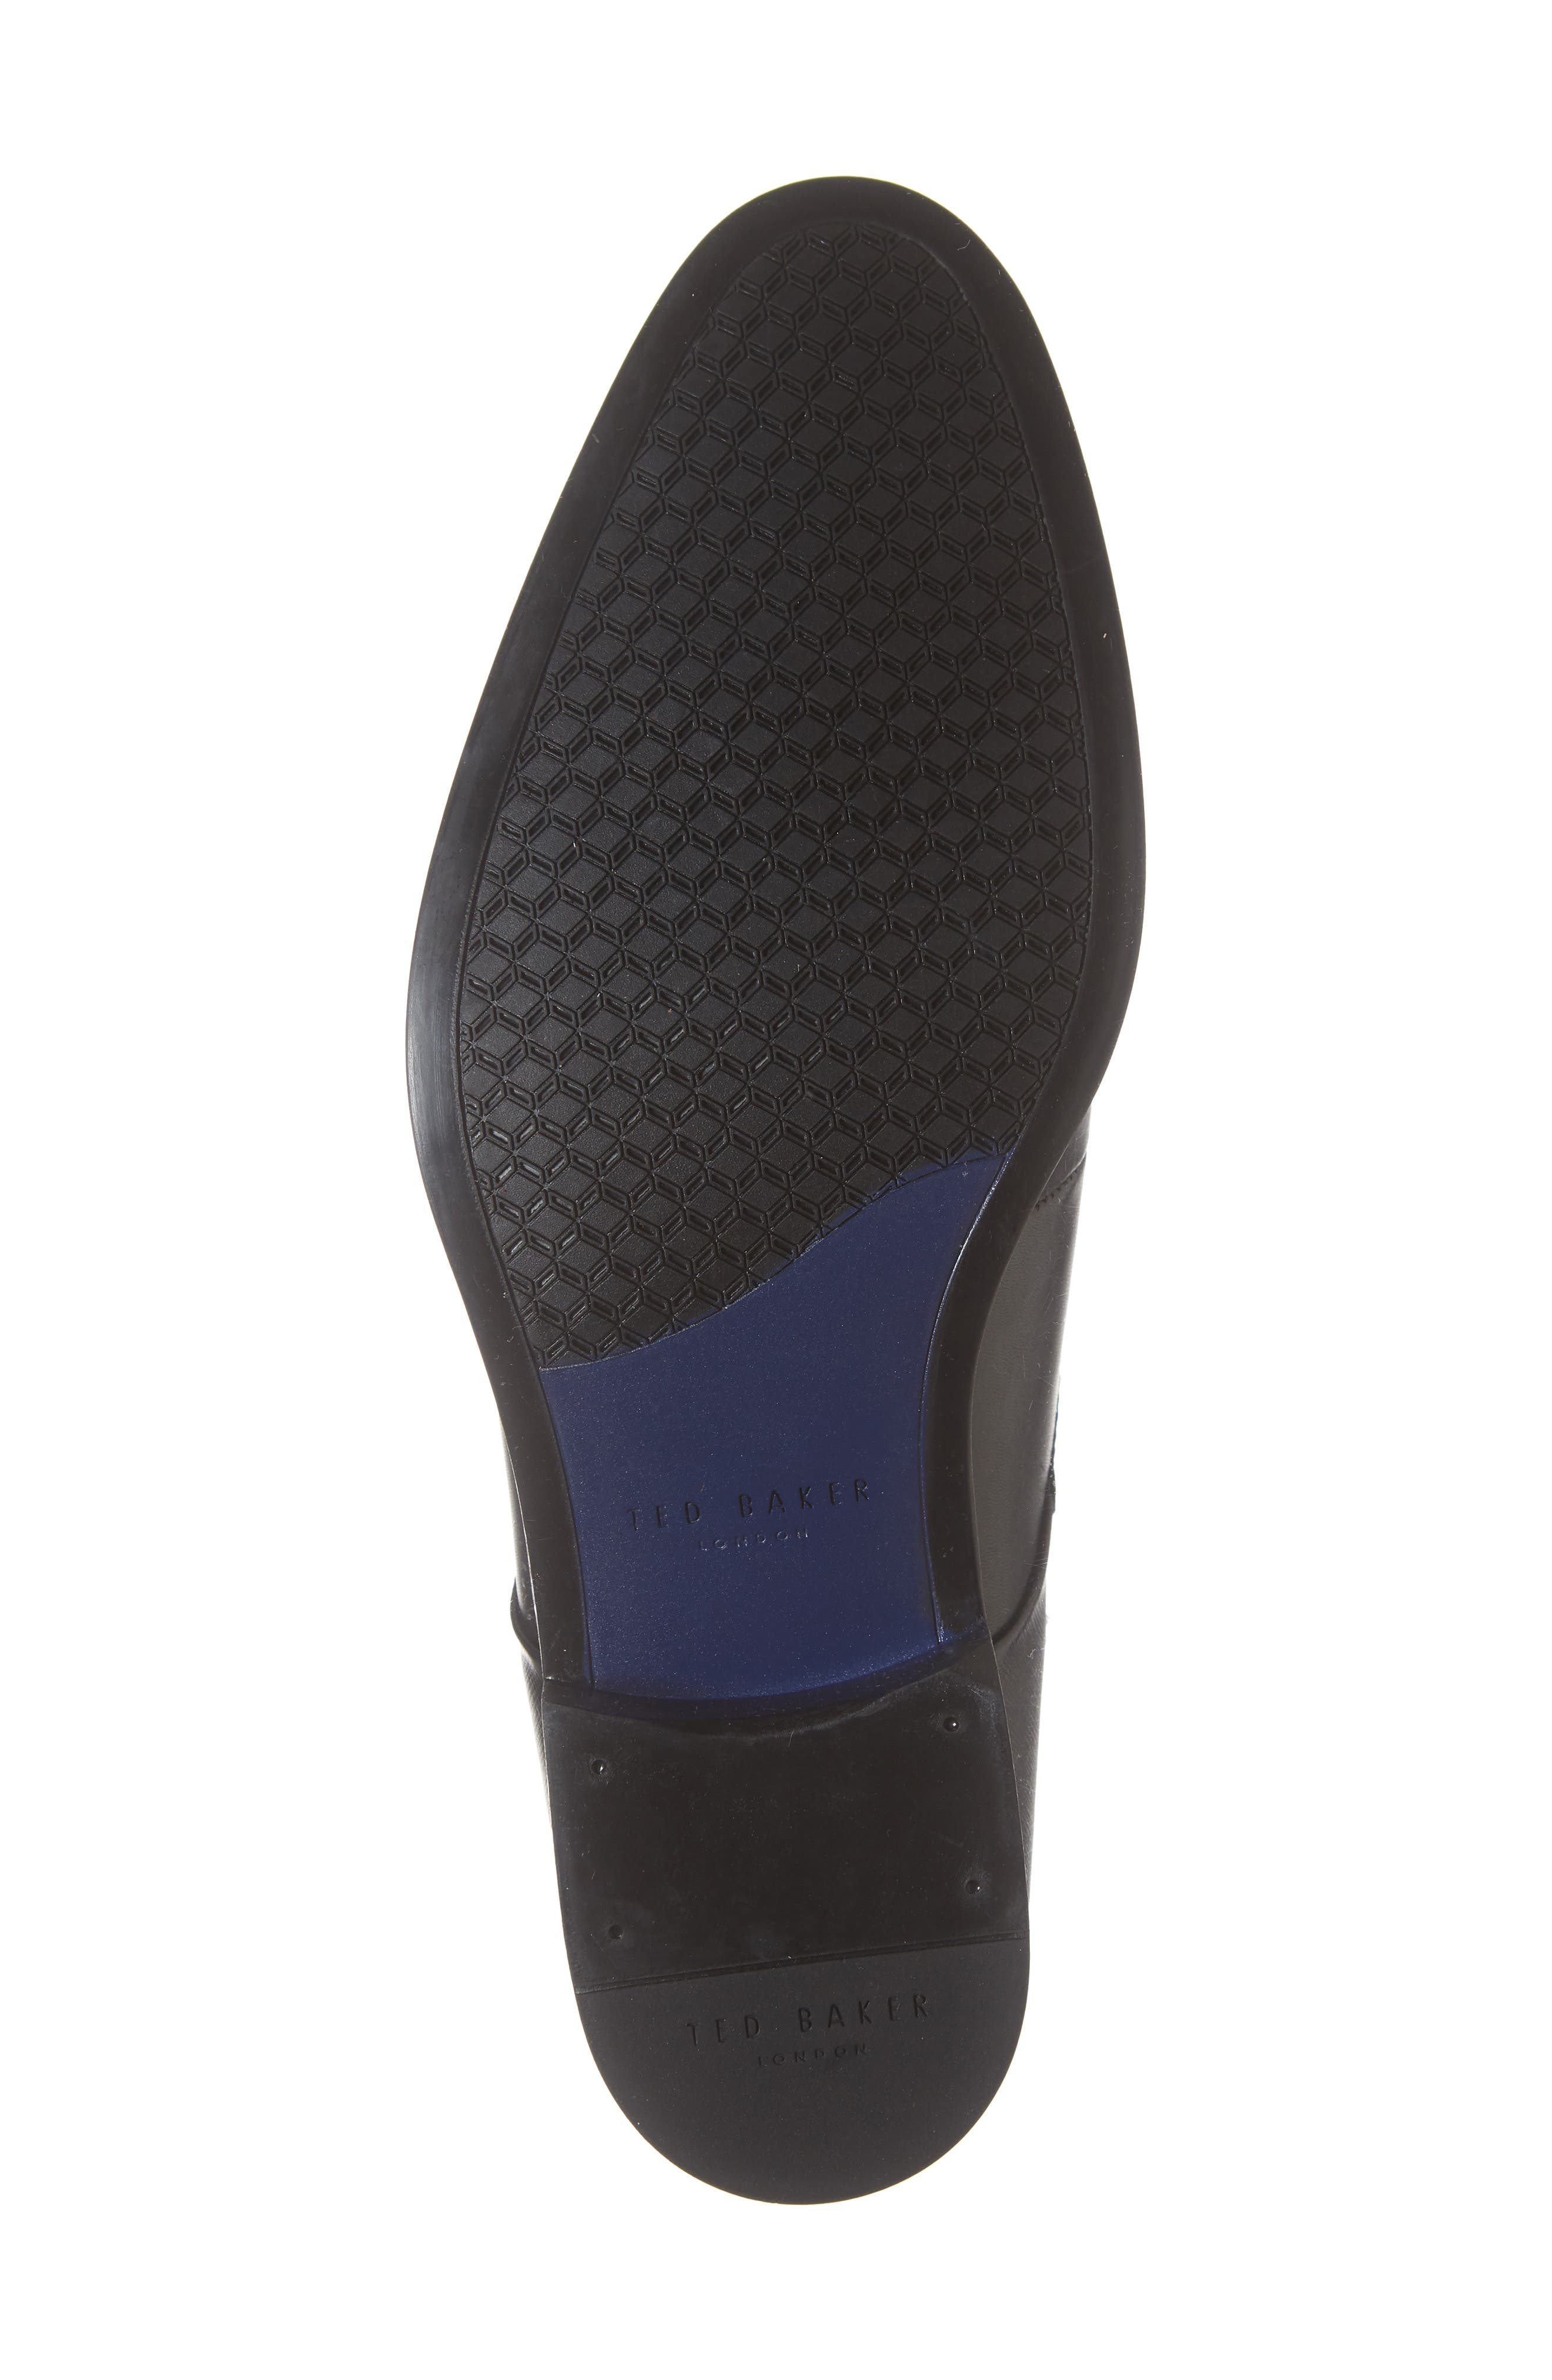 TED BAKER LONDON, Cathon Double Buckle Monk Shoe, Alternate thumbnail 6, color, BLACK LEATHER